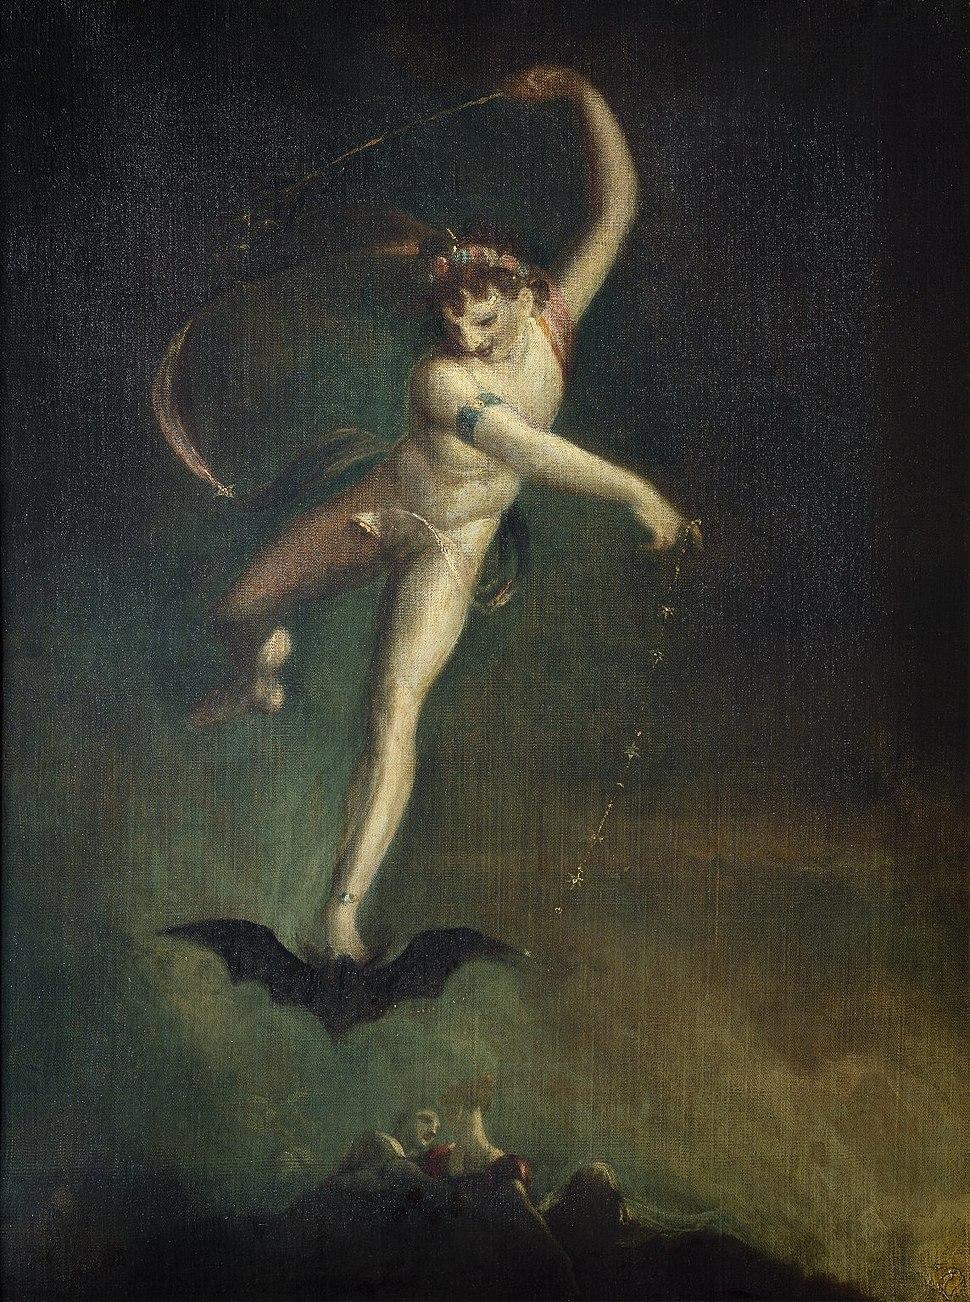 Ariel (Fuseli, c.1800-1810)